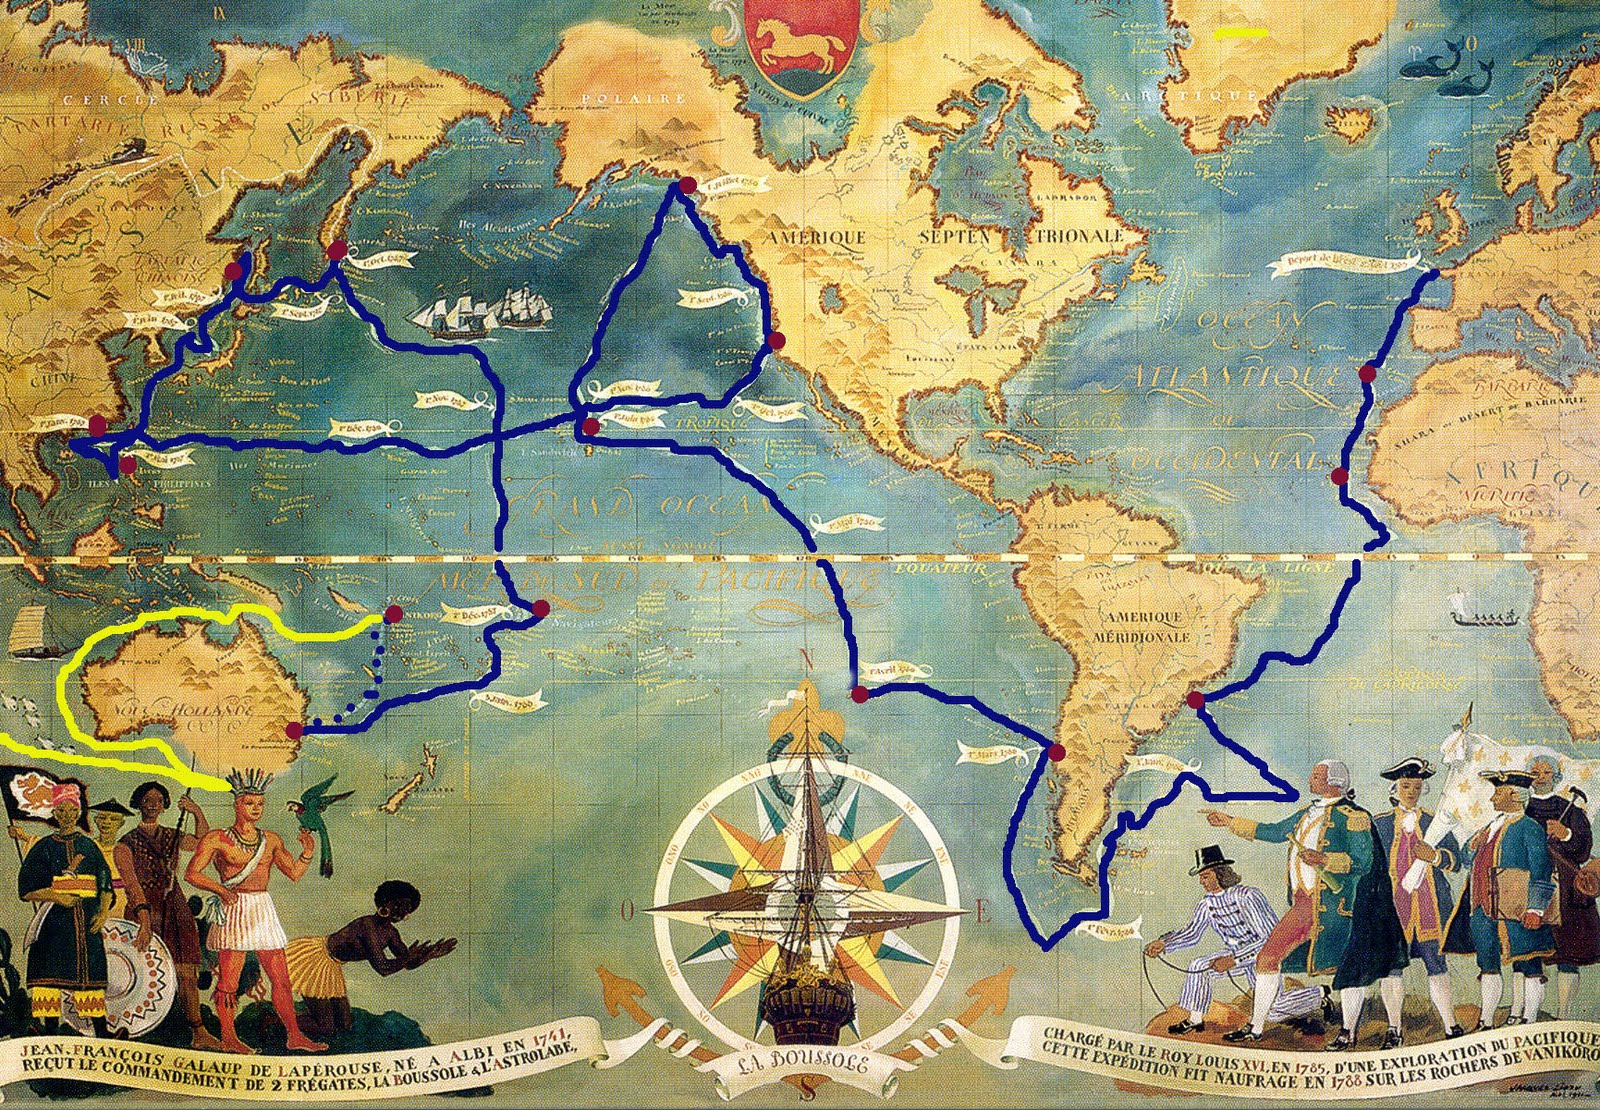 mon voyage prefere essay